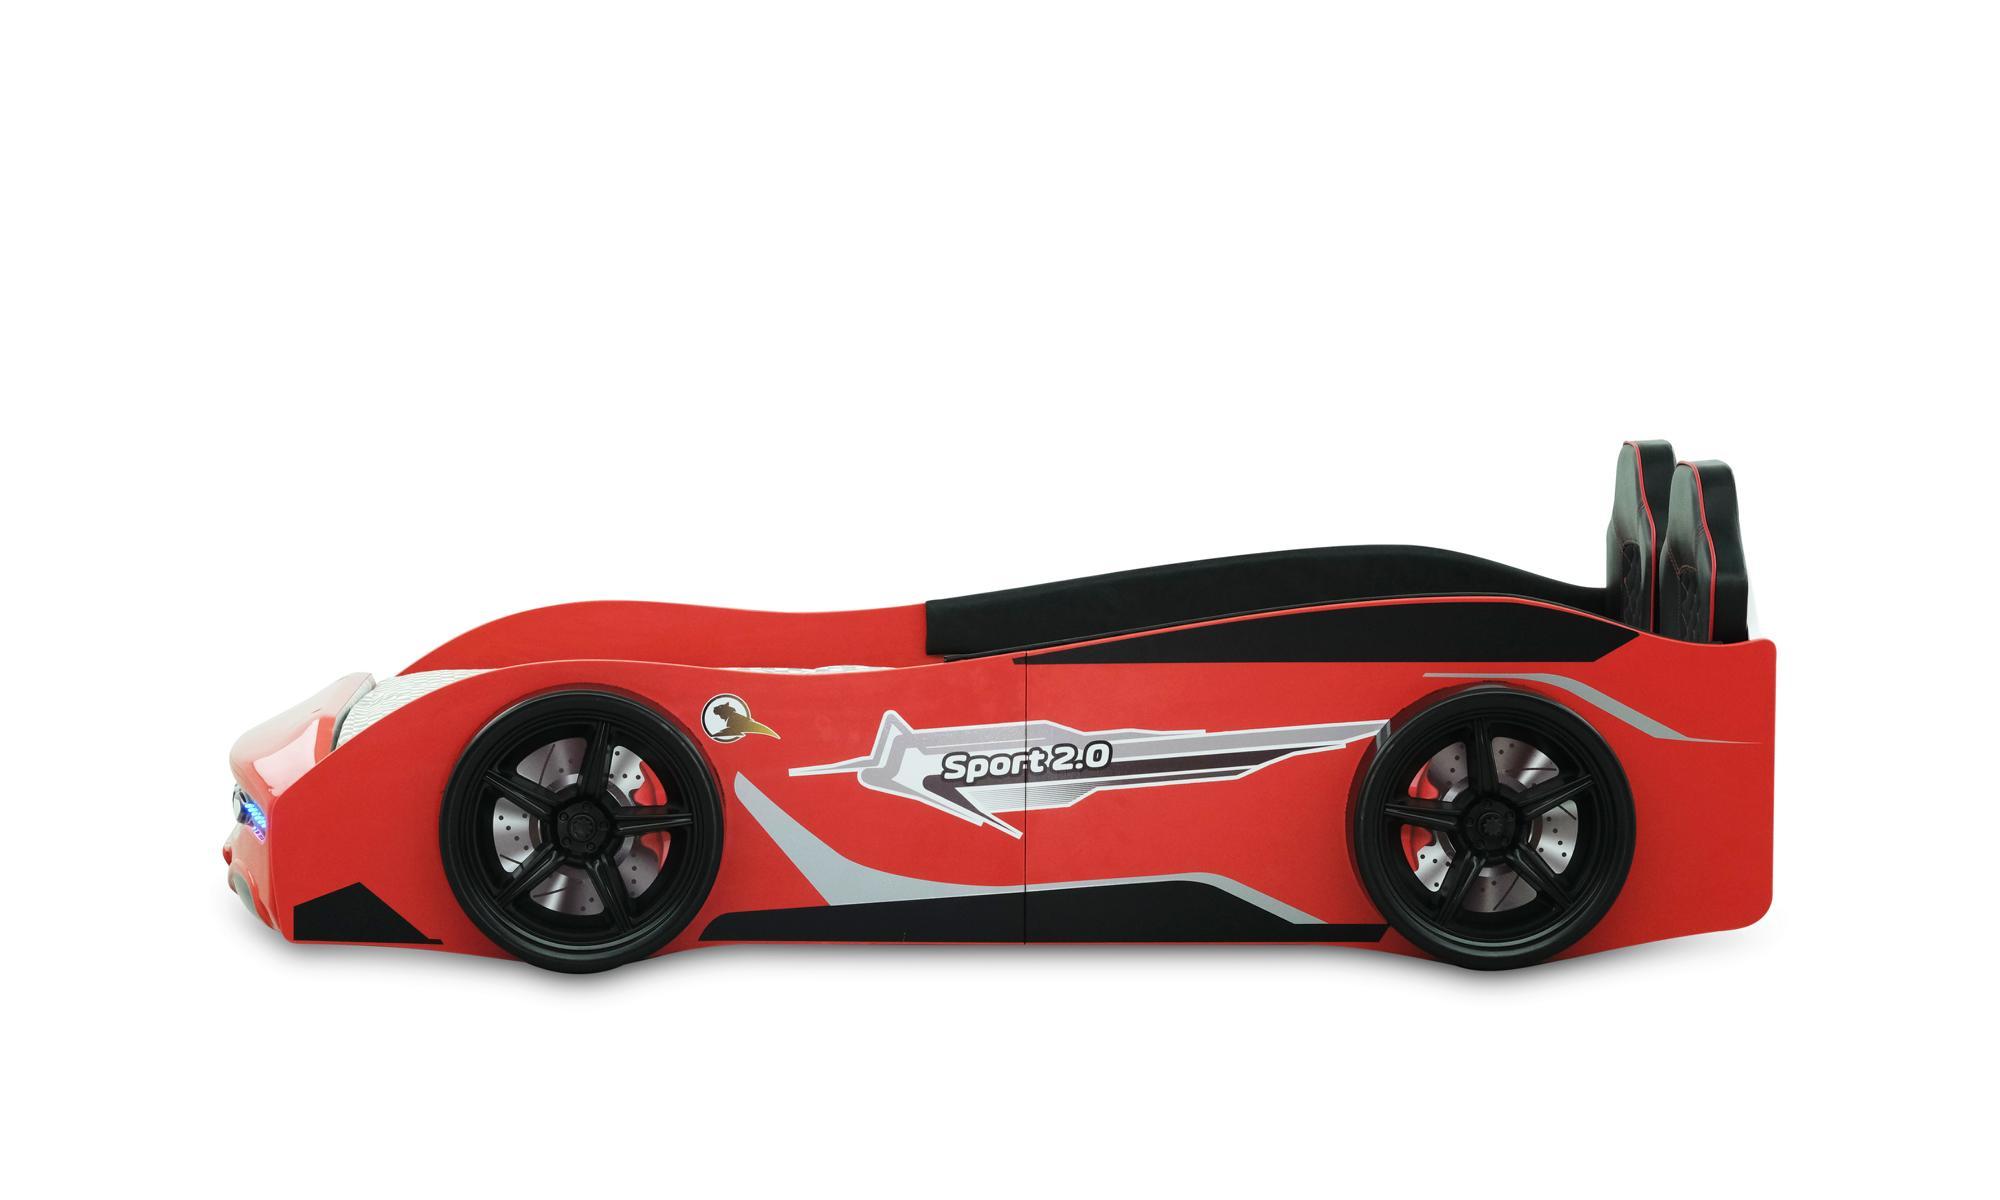 Autobett Kinderbett Sport 2.0 Rot mit Spoiler